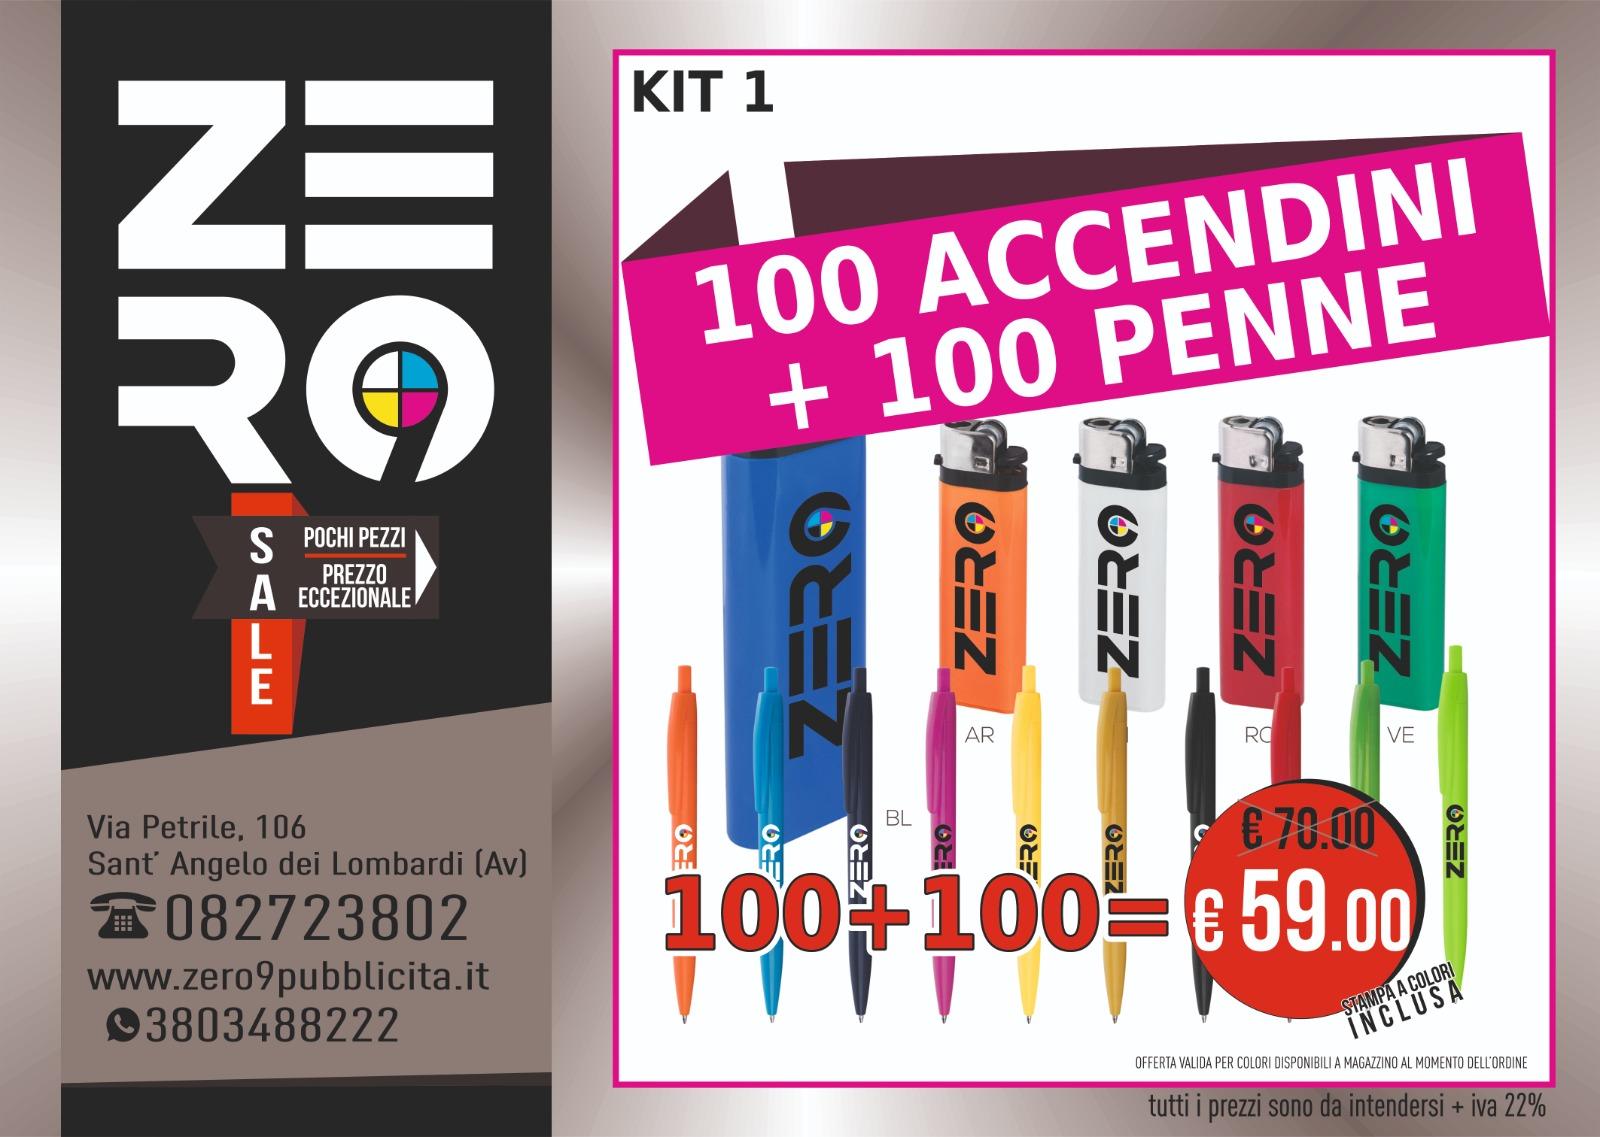 100 Accendini + 100 Penne